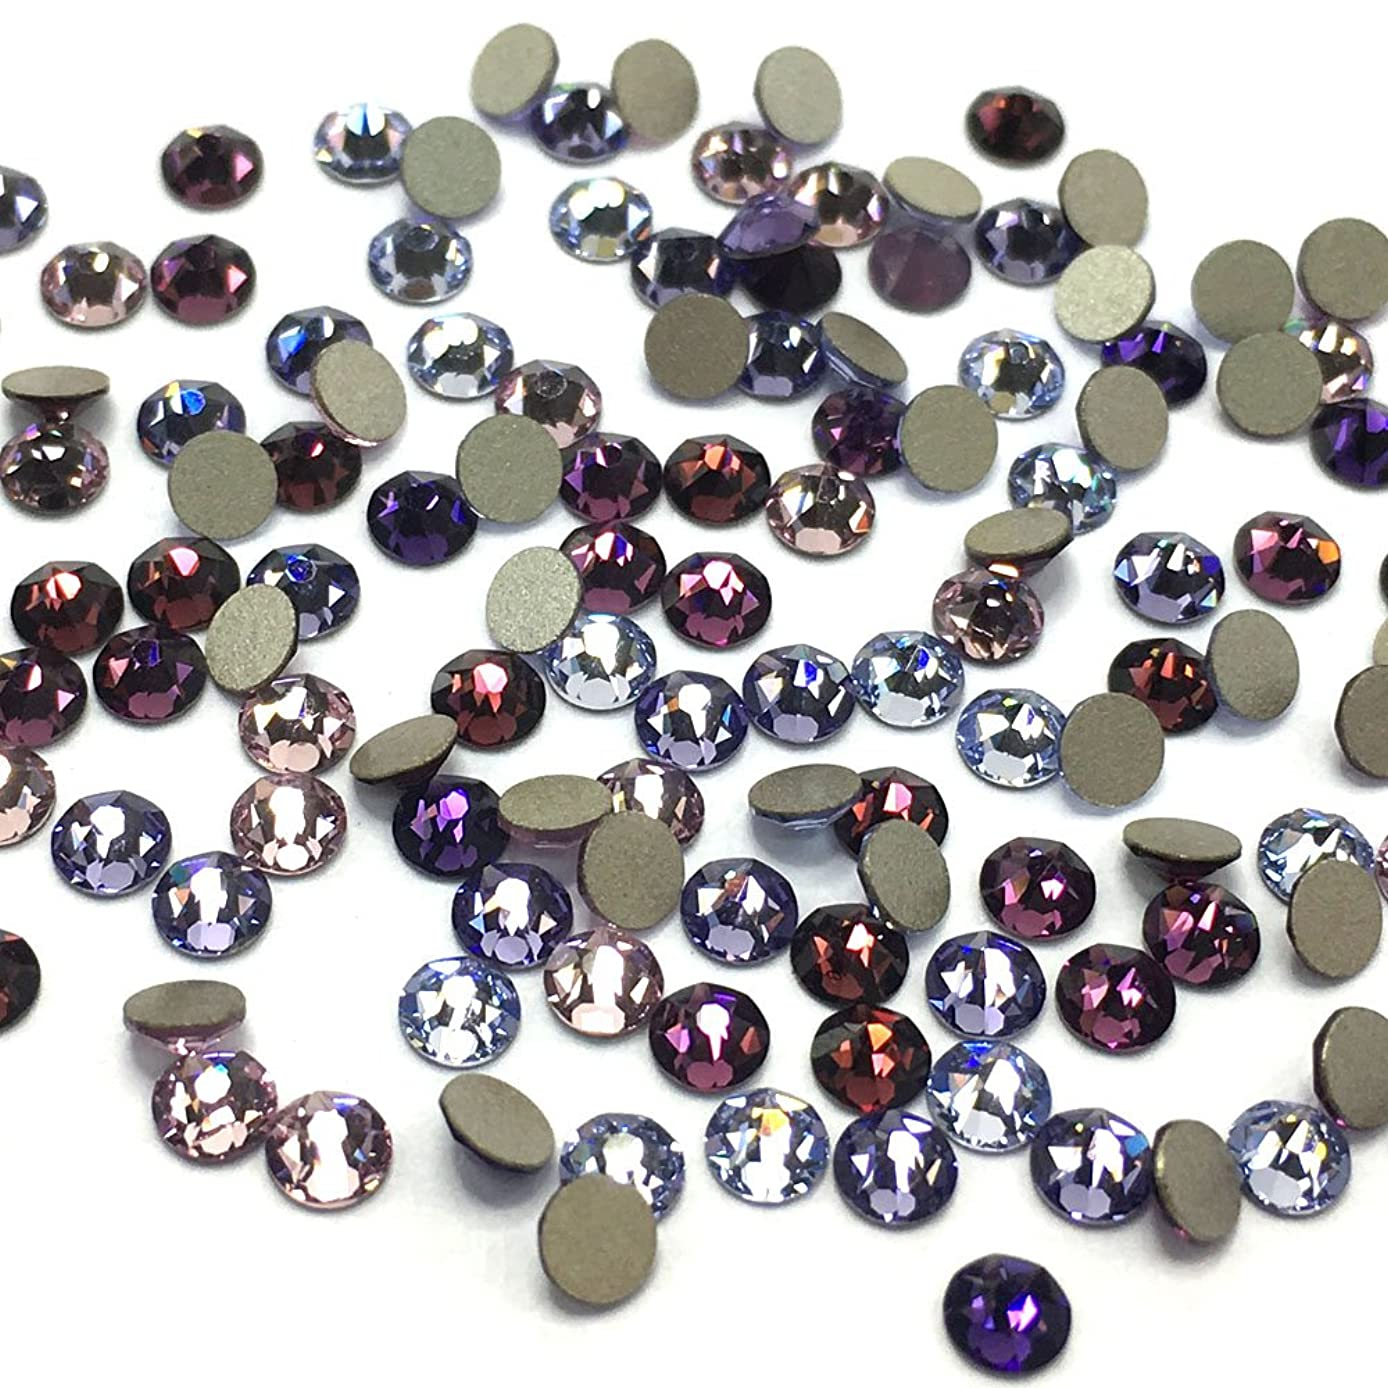 144 pcs (1 gross) Swarovski 2058 Xilion / 2088 Xirius SS12 (3.1mm) crystal flatbacks No-Hotfix rhinestones nail art PURPLE Color Mix **FREE Shipping from Mychobos (Crystal-Wholesale)**